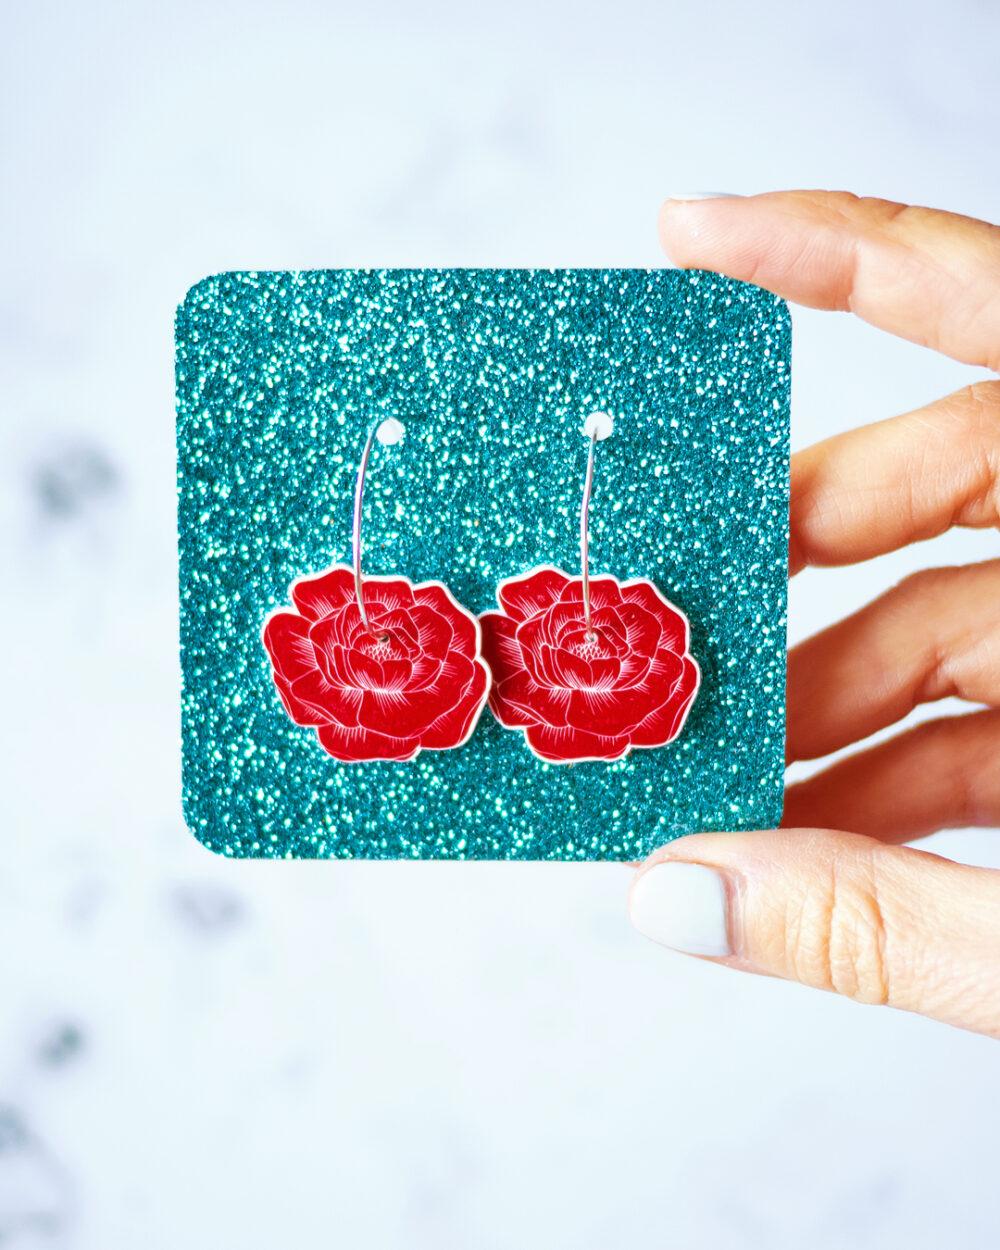 ana-sola-pendientes-aro-flores-peonia-roja